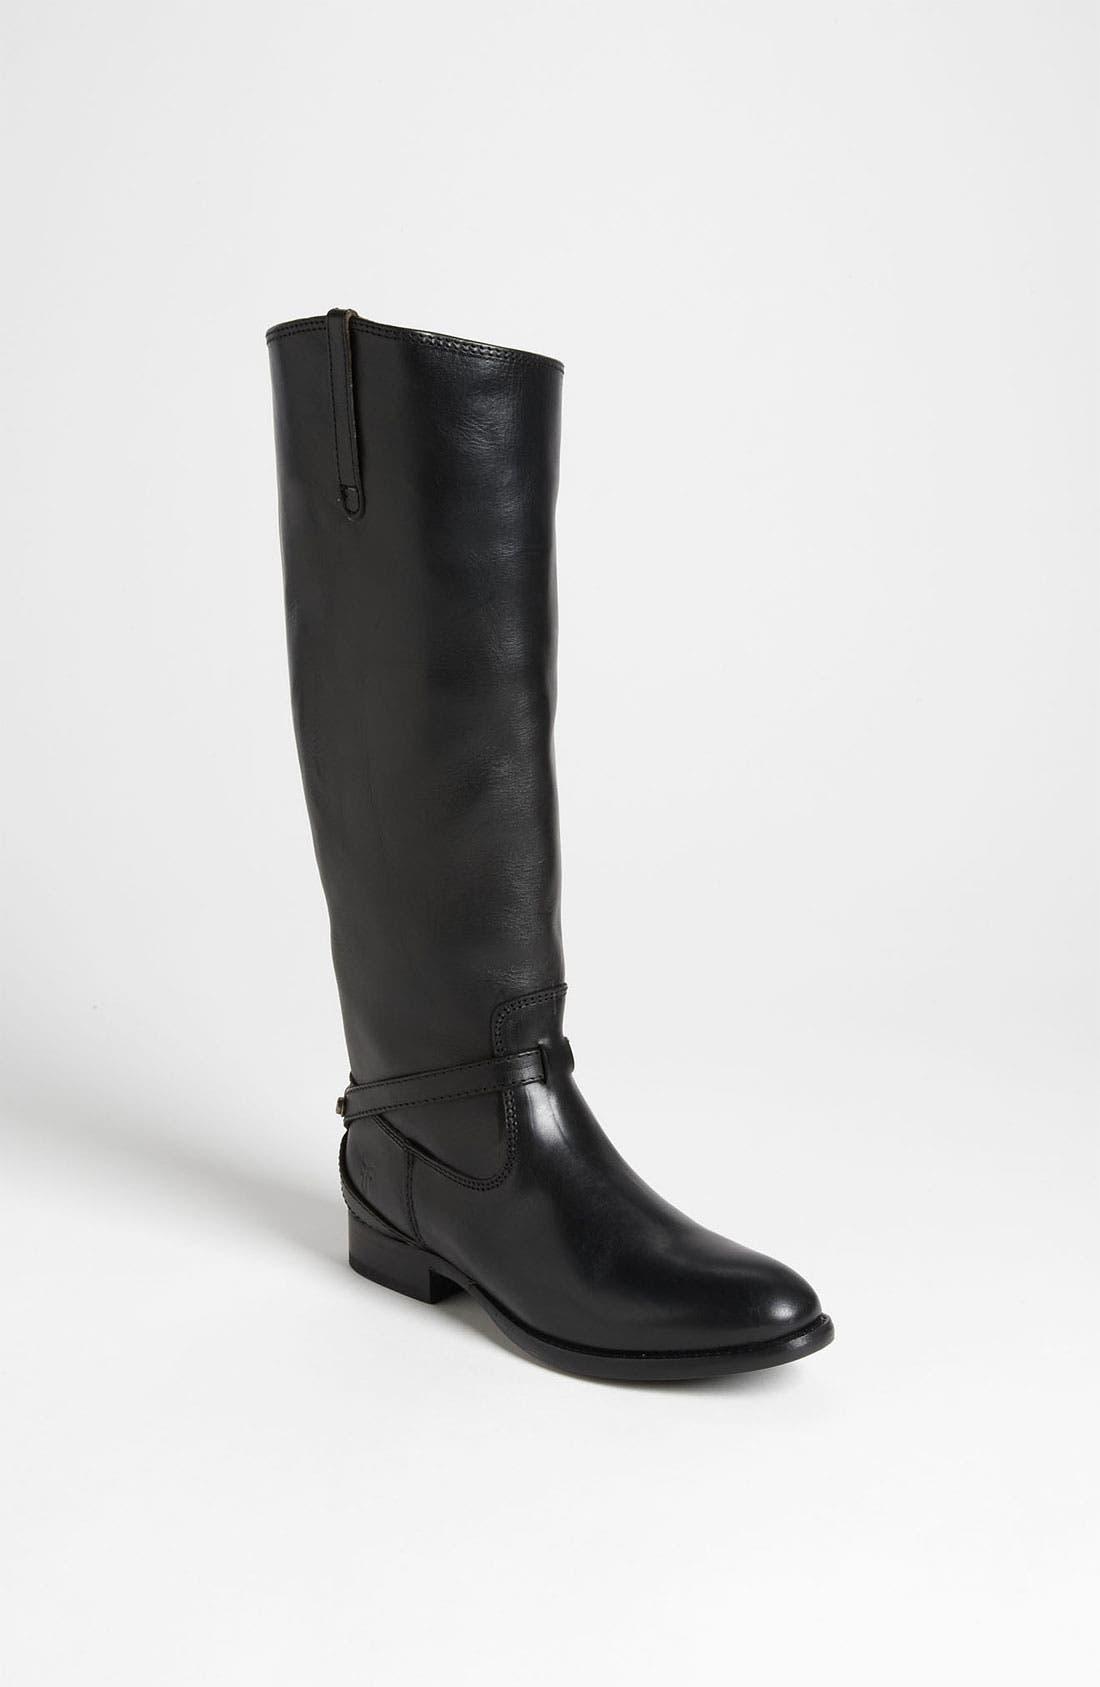 Alternate Image 1 Selected - Frye 'Lindsay Plate' Boot